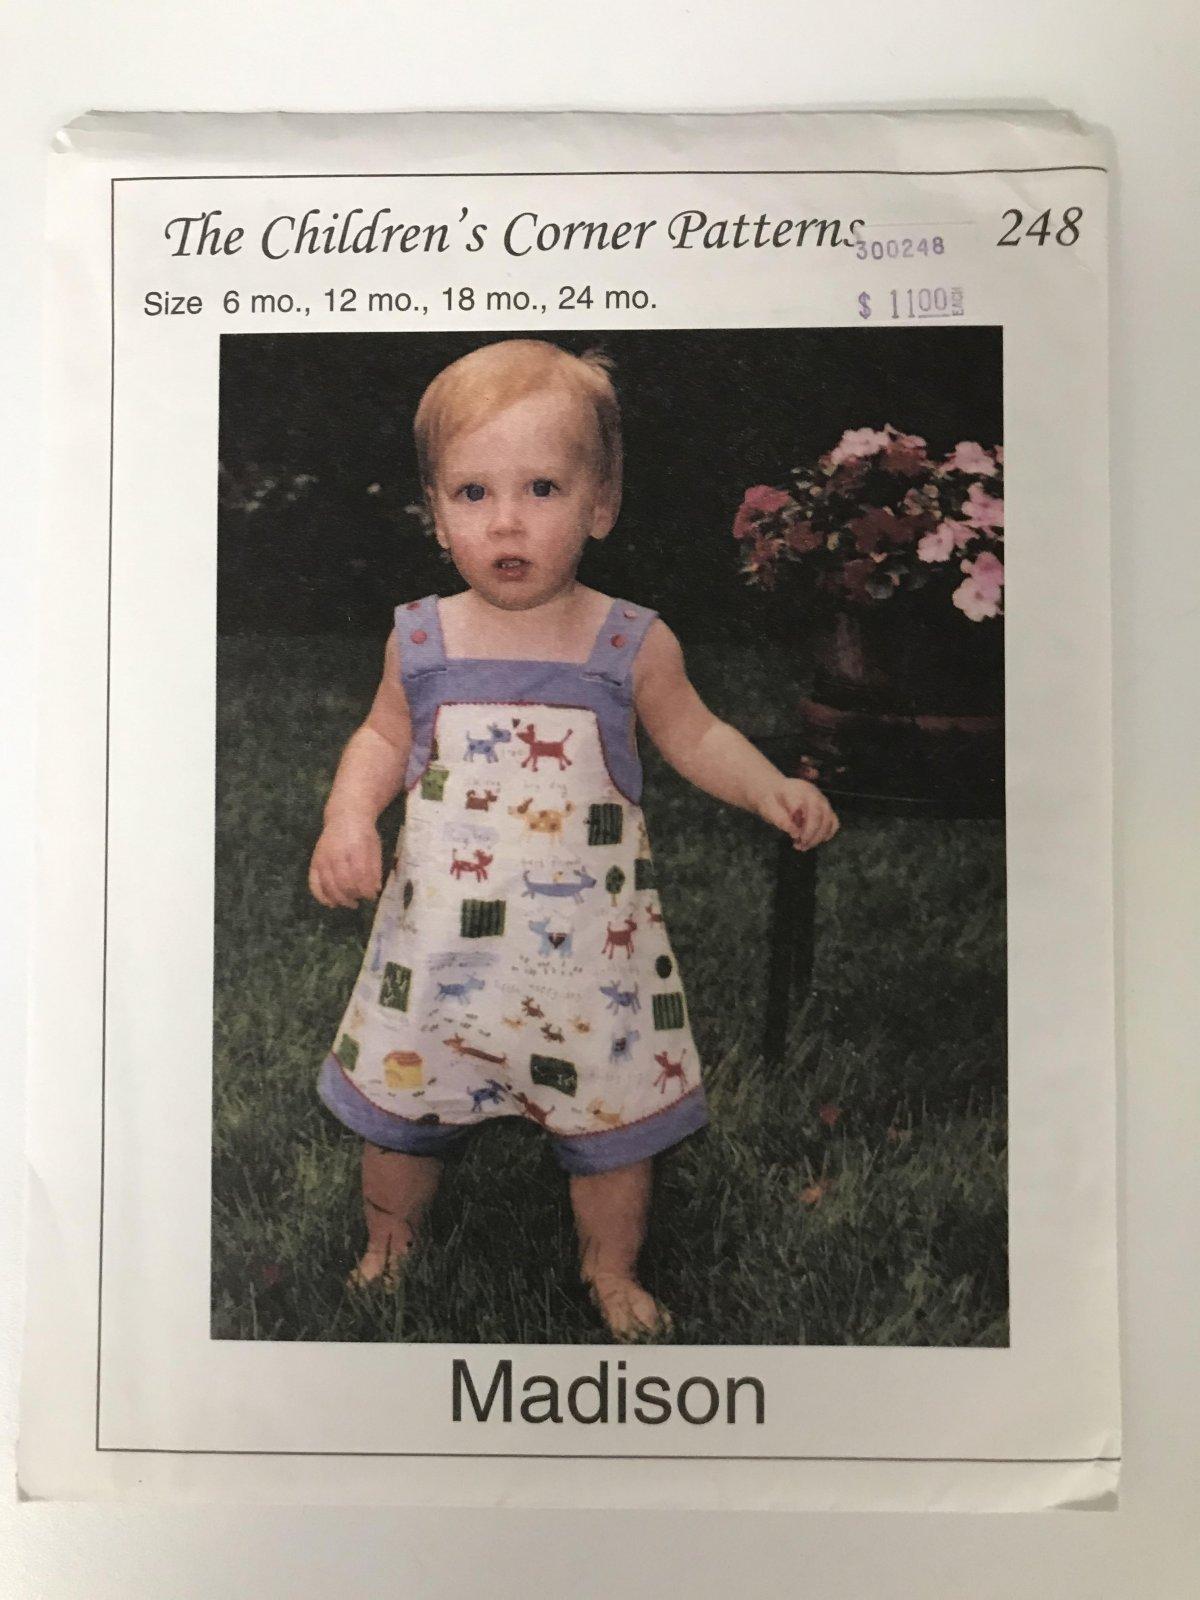 CHILDREN'S CORNER MADISON